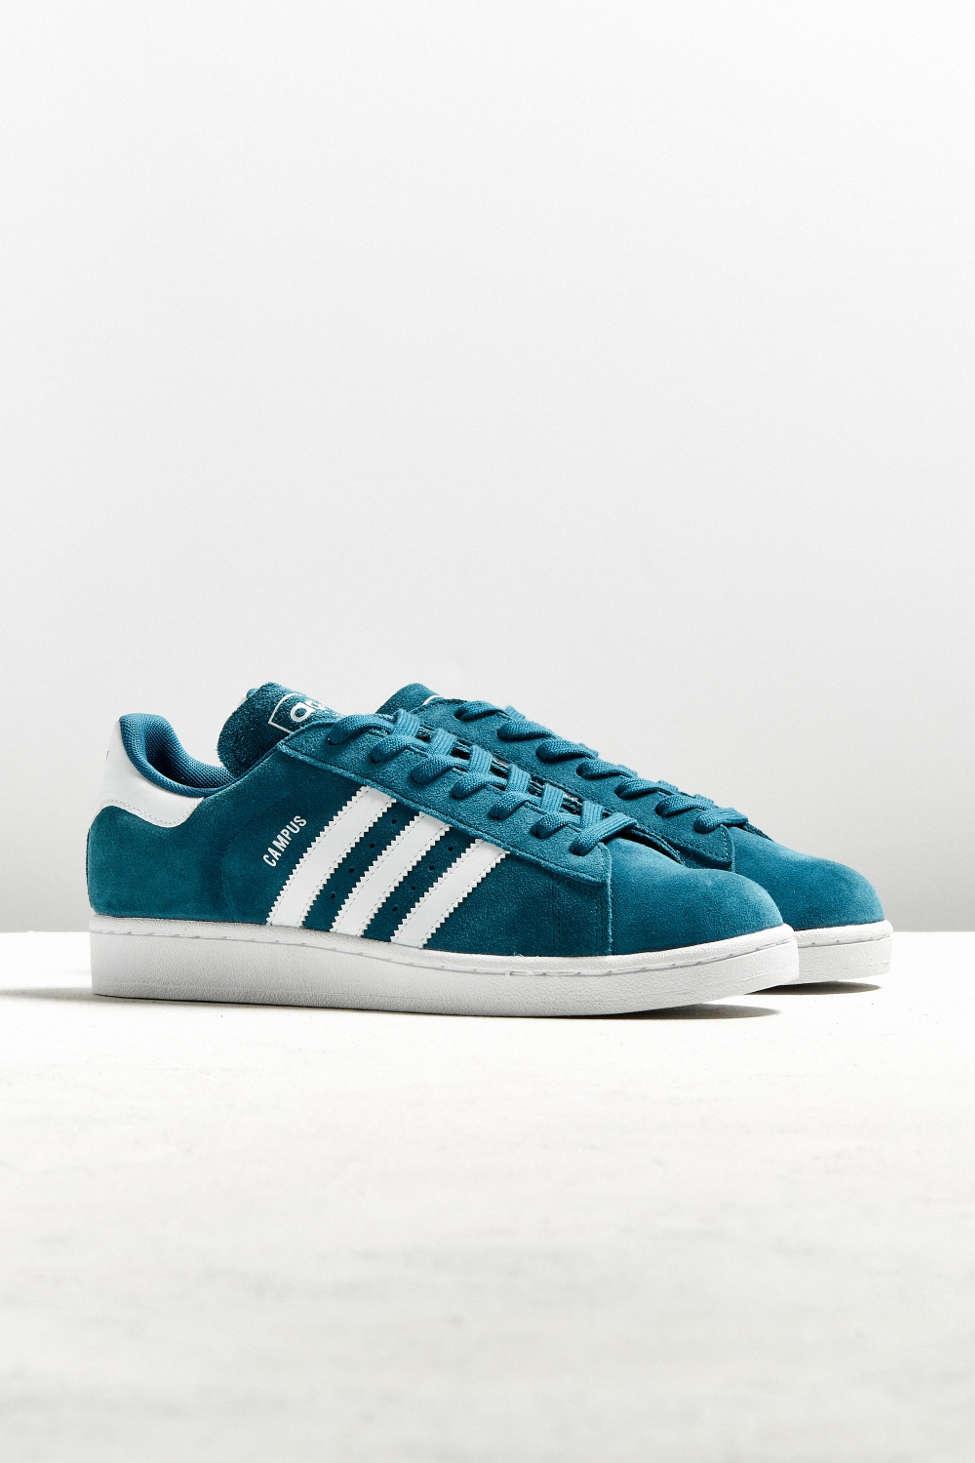 Adidas Originals Campus 2 sneakers campus 2 adidas originals | urban outfitters canada